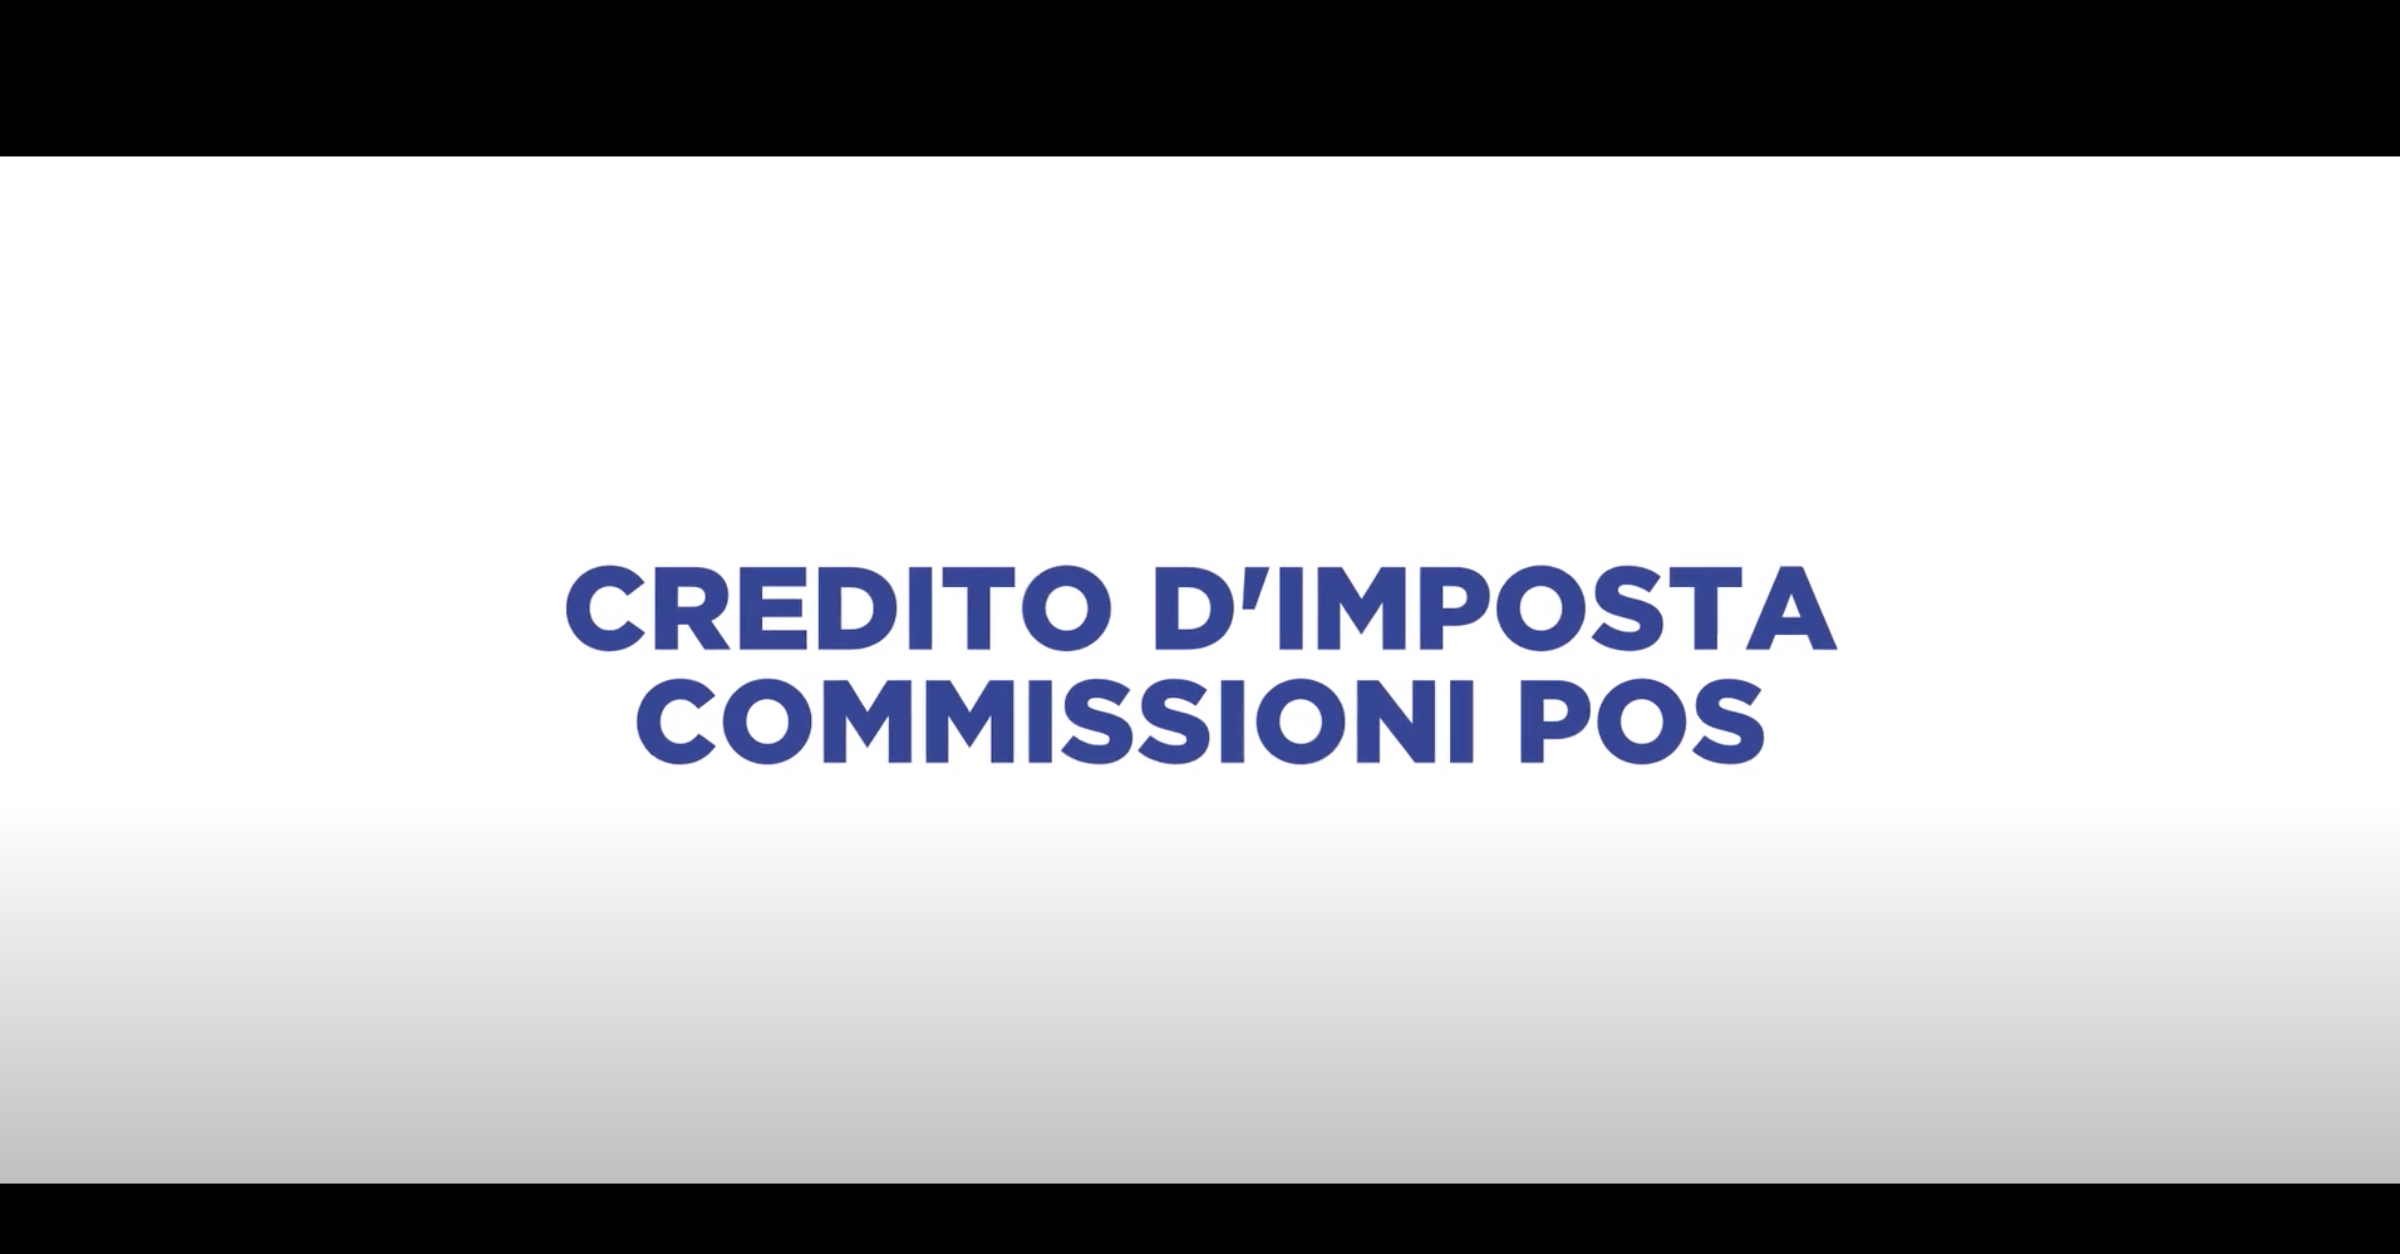 CREDITO D'IMPOSTA COMMISSIONI POS